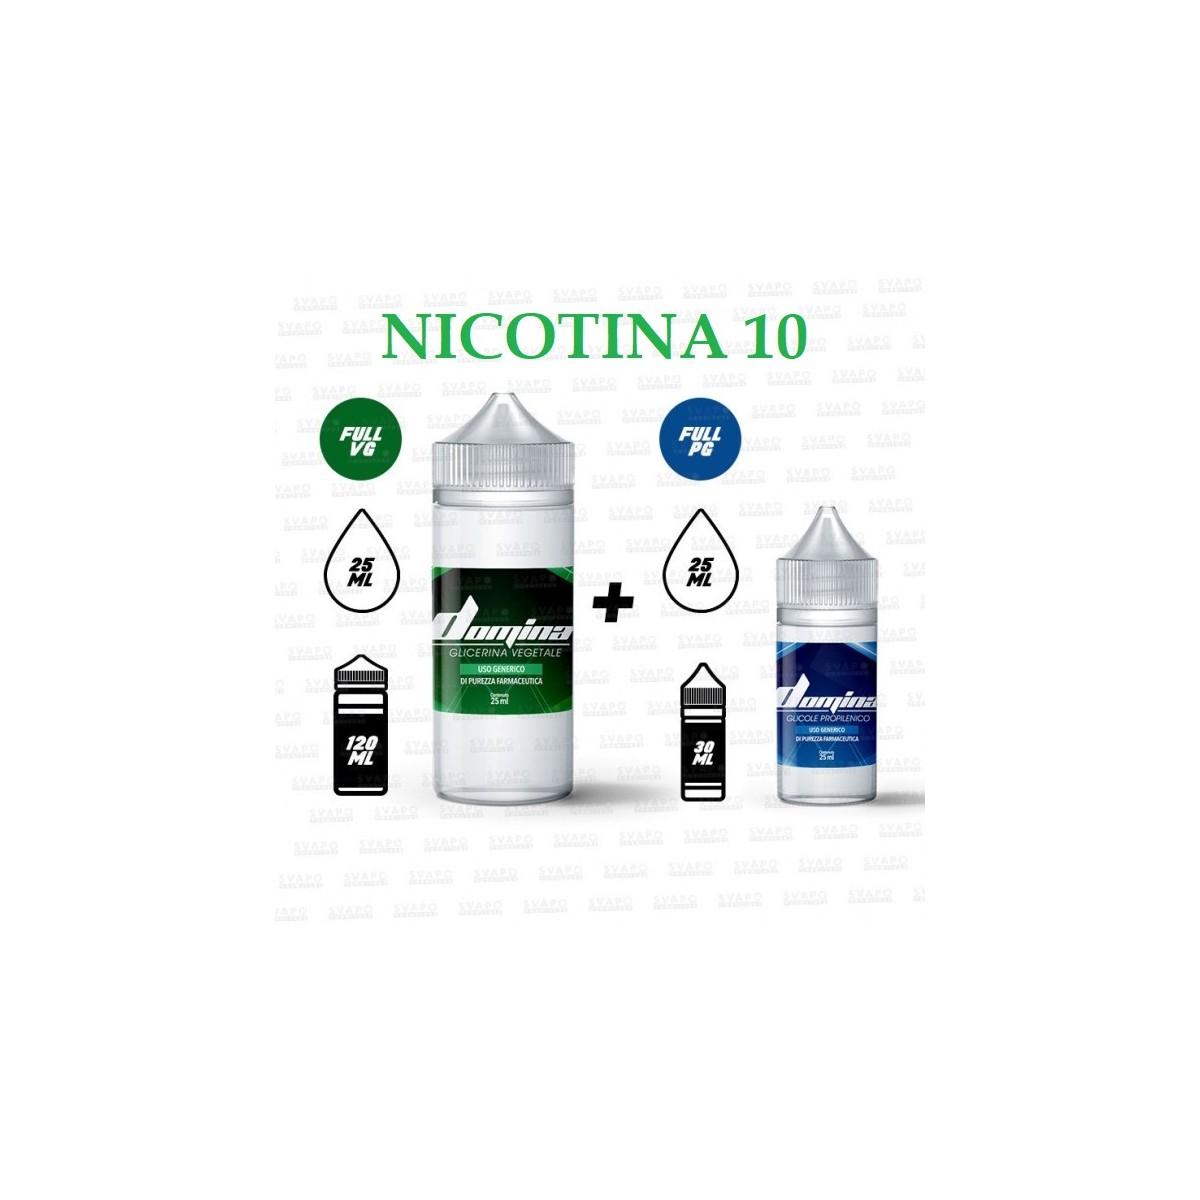 Bundle - Domina 100 Series 50/50 - 10mg/ml Nic